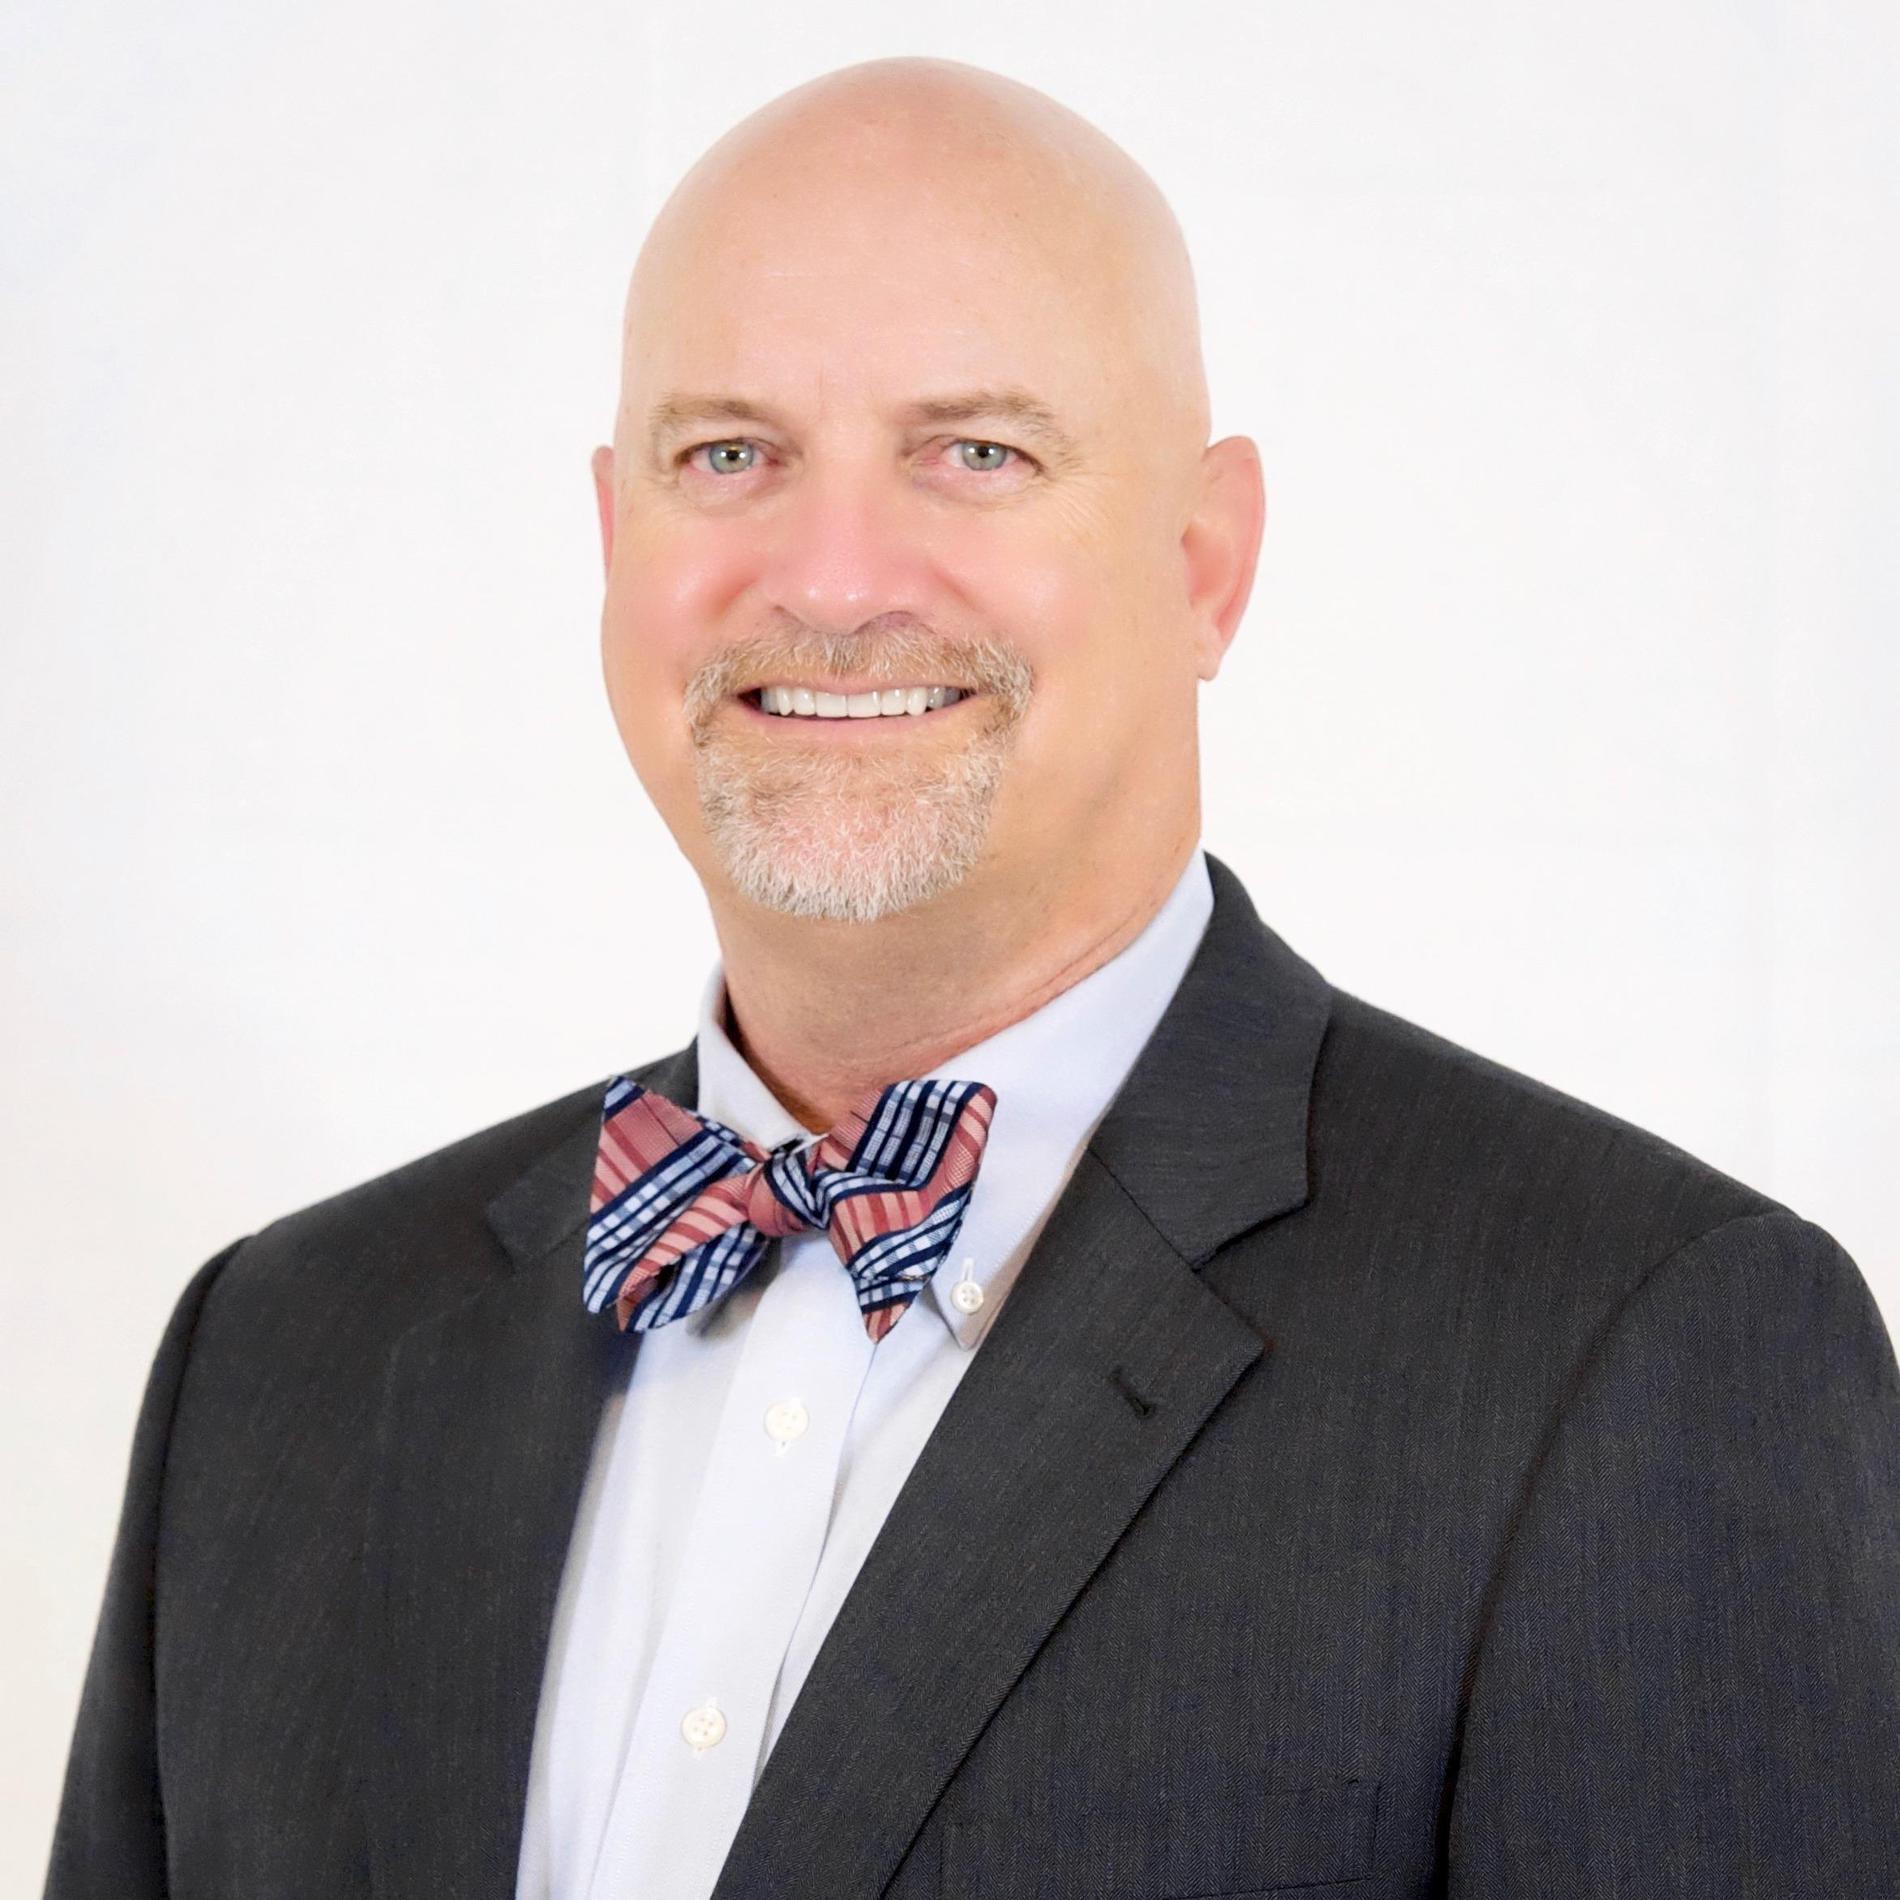 John C Few | Tampa, FL | Morgan Stanley Wealth Management